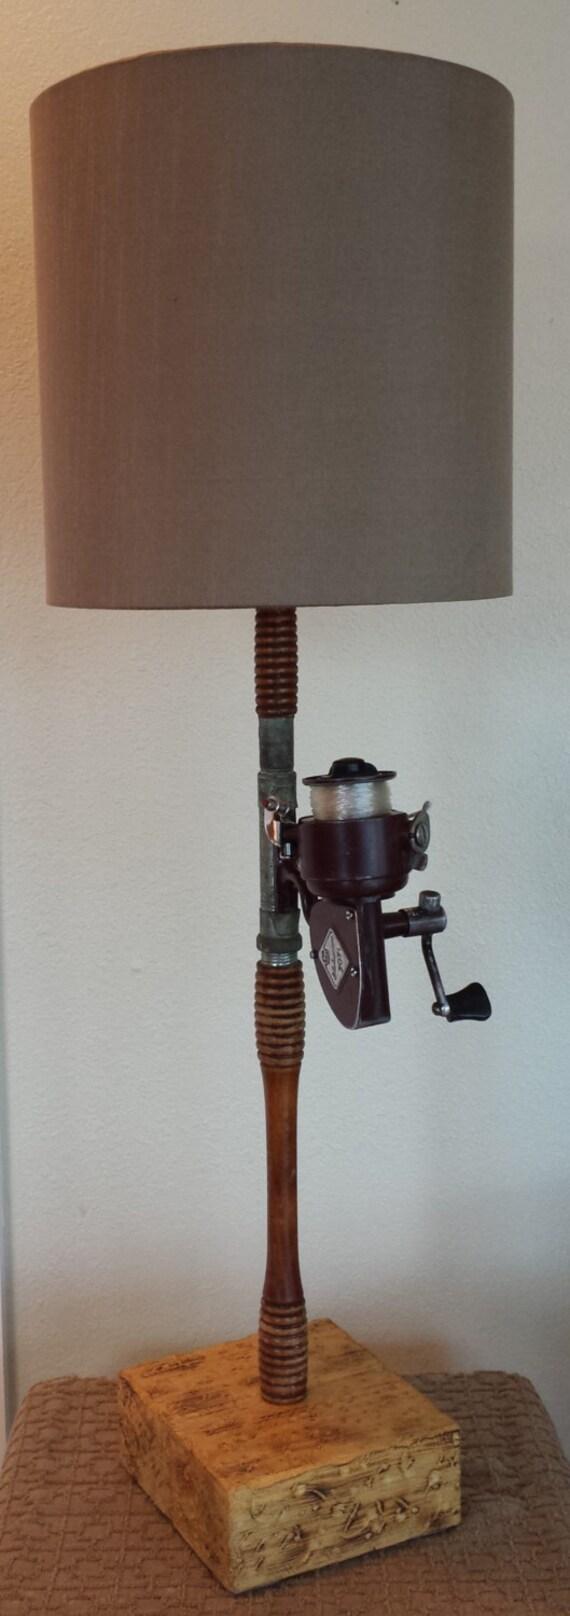 Fishing pole lamp antique fishing rod and reel lamp coastal for Fishing pole decor